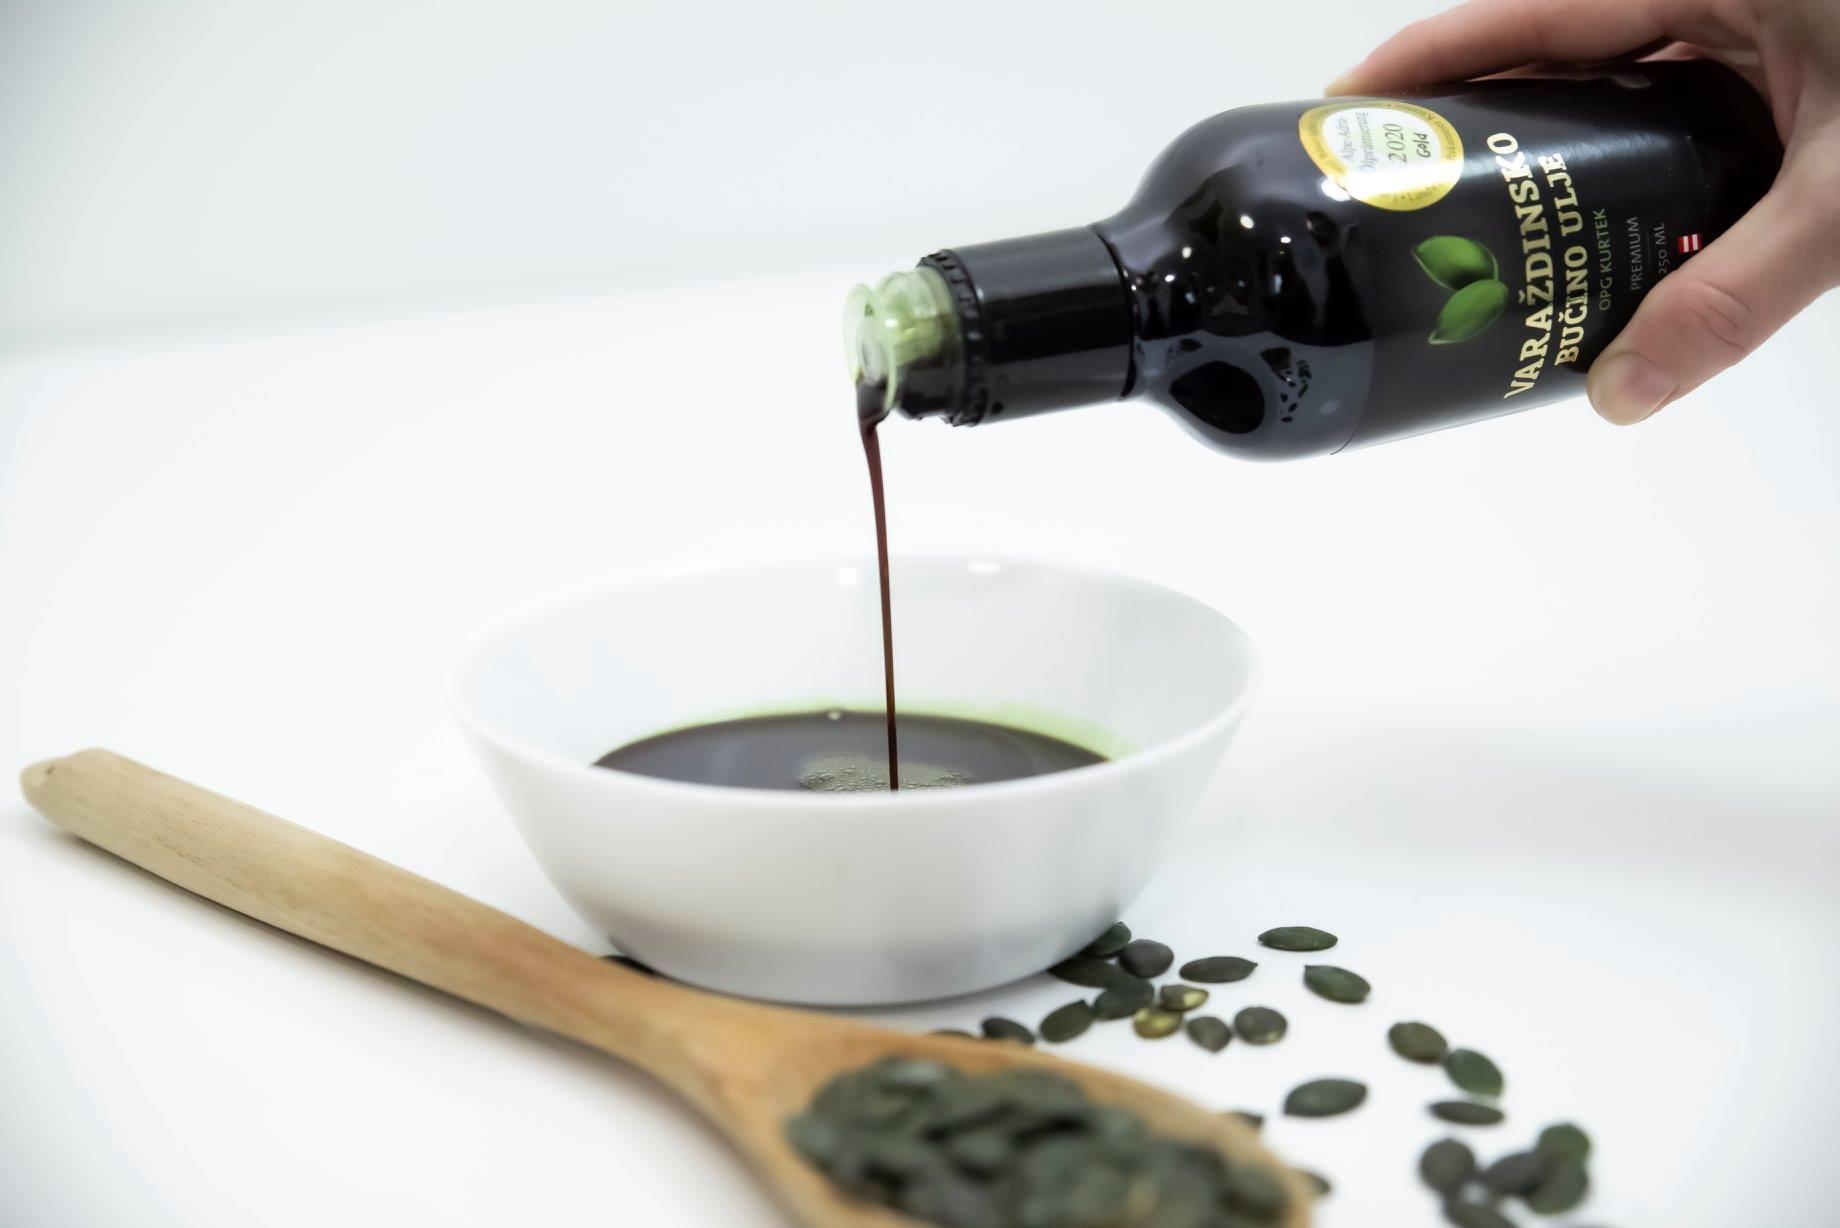 Varaždin pumpkin seed oil declared world's best at prestigious competition